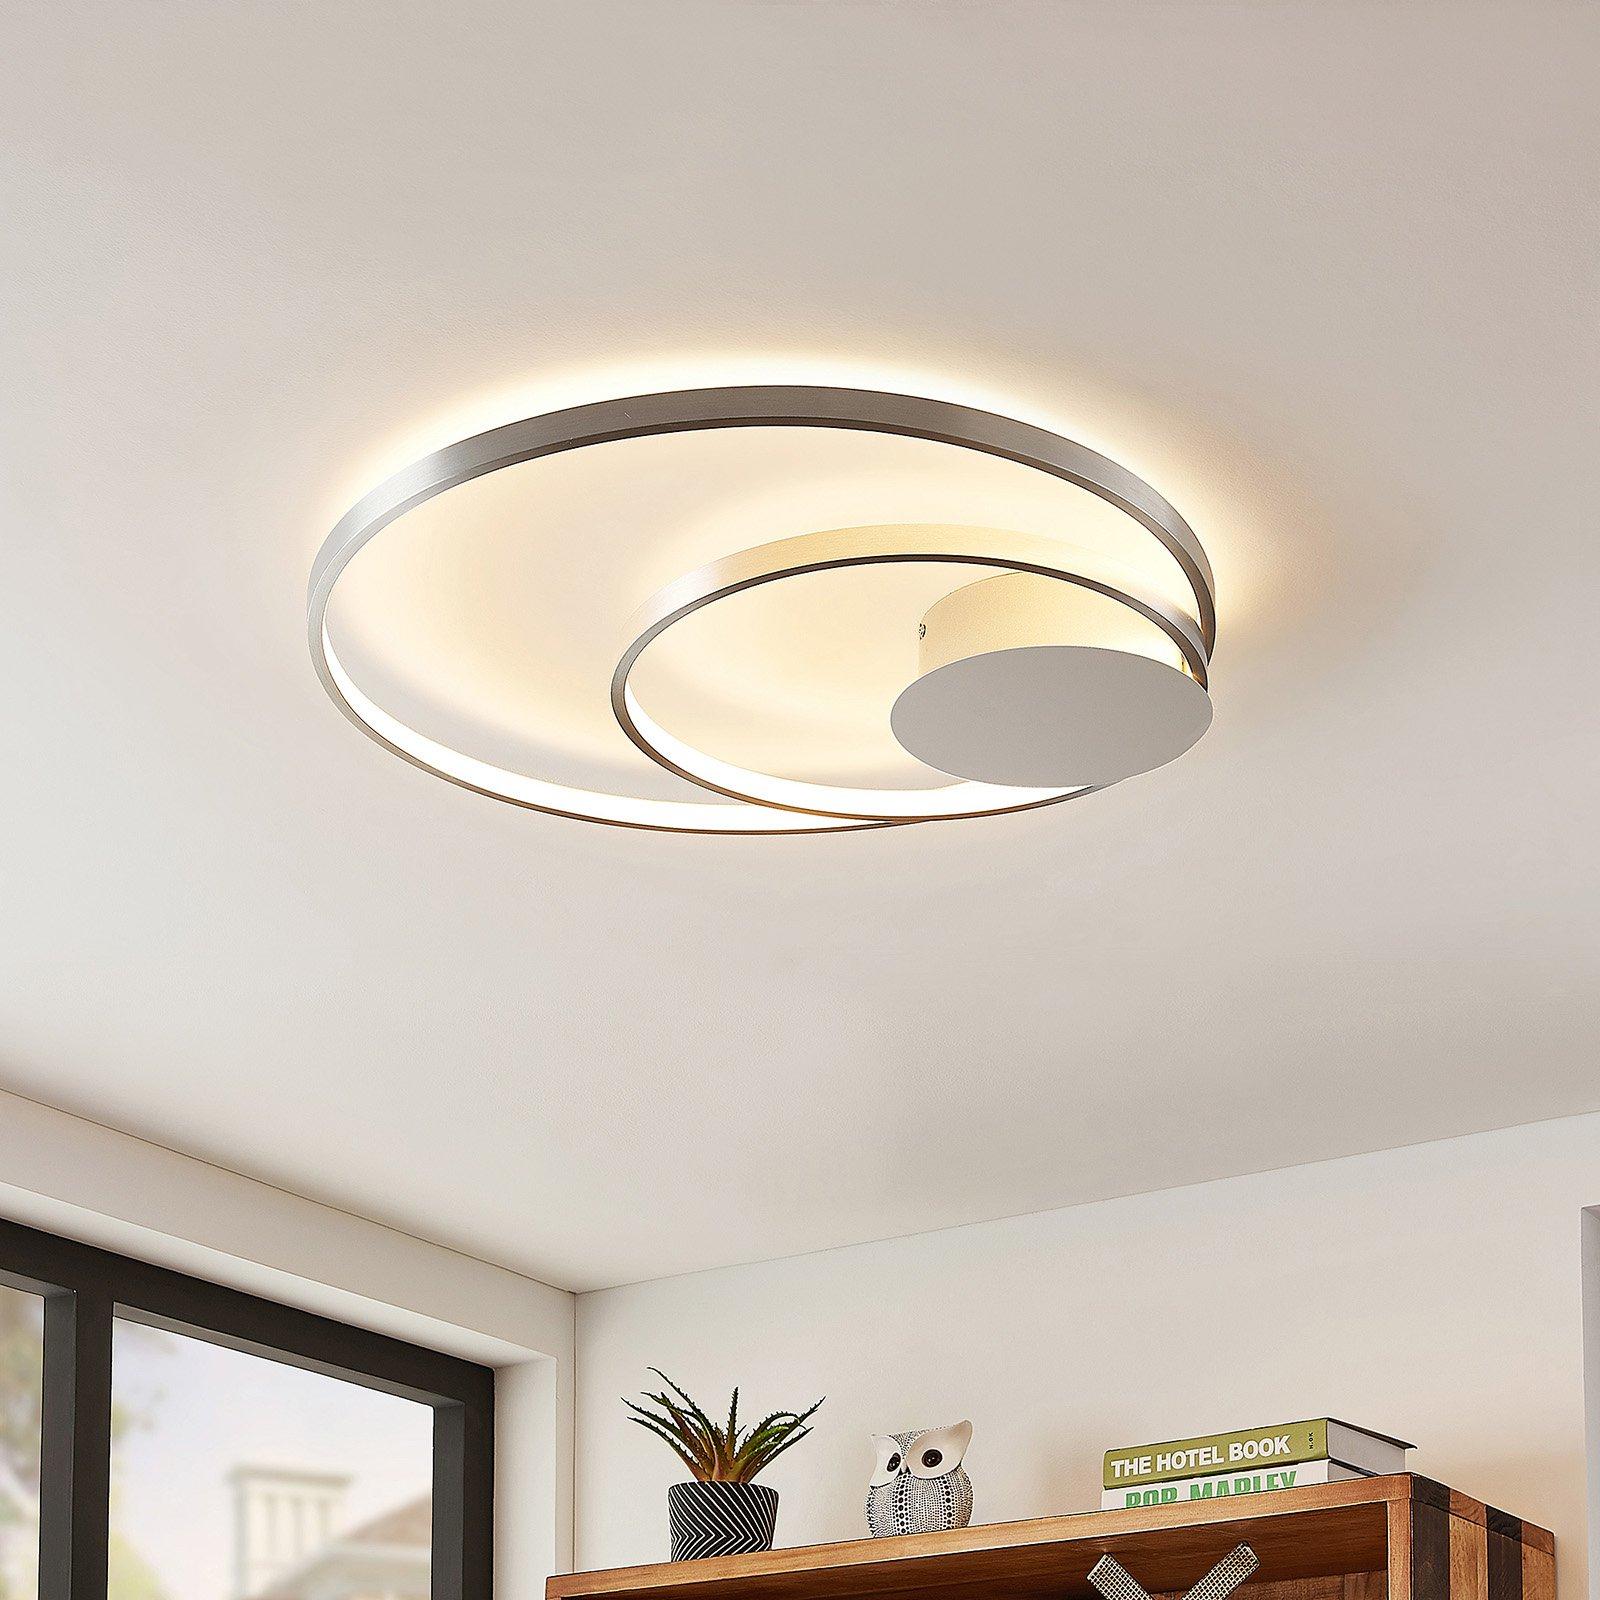 Lindby Nerwin LED-taklampe, rund, alu/krom